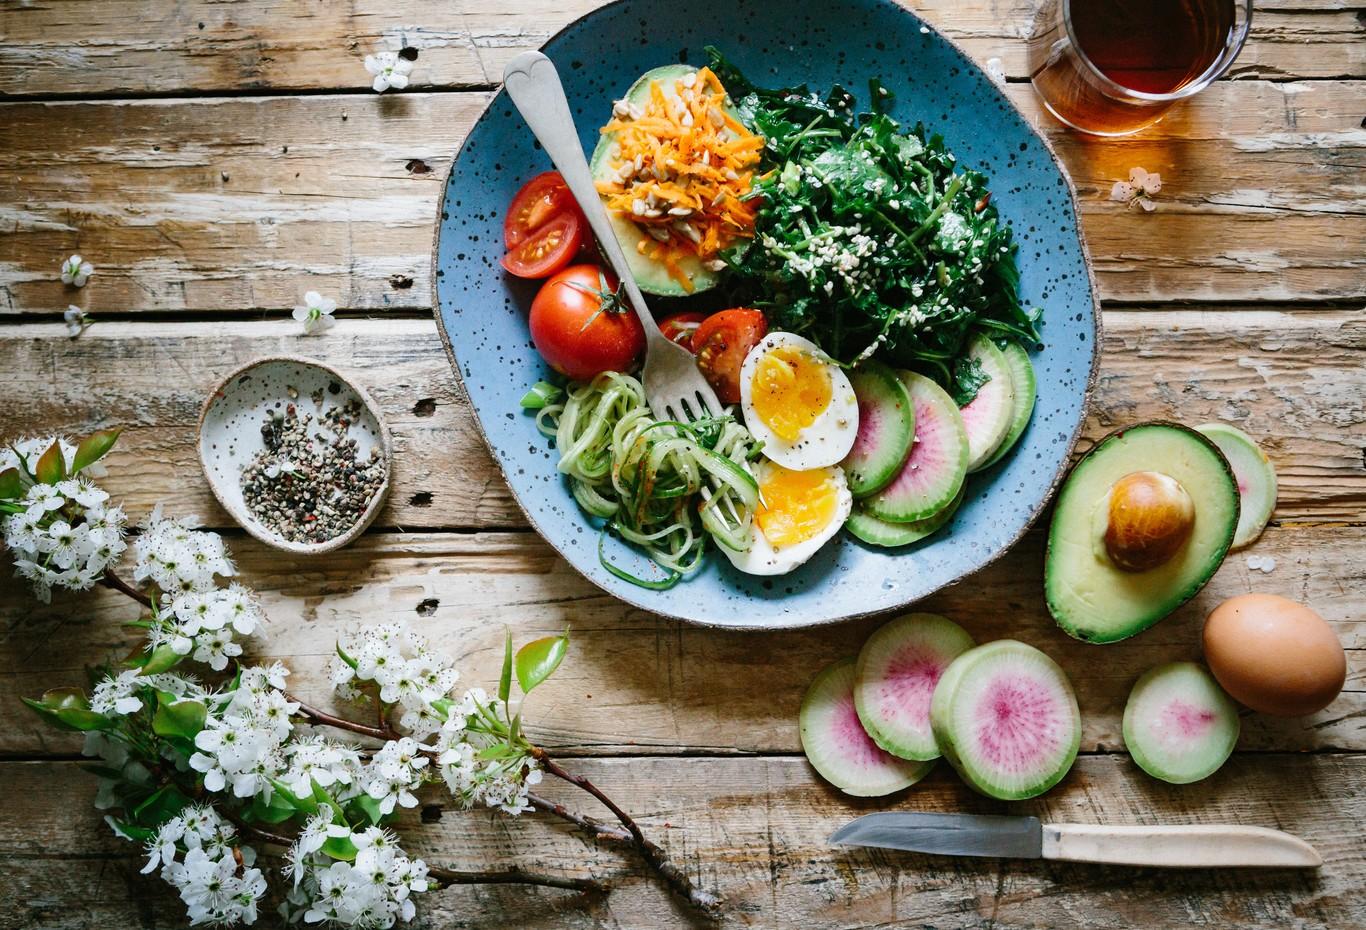 dieta proteica vegetariana para adelgazar